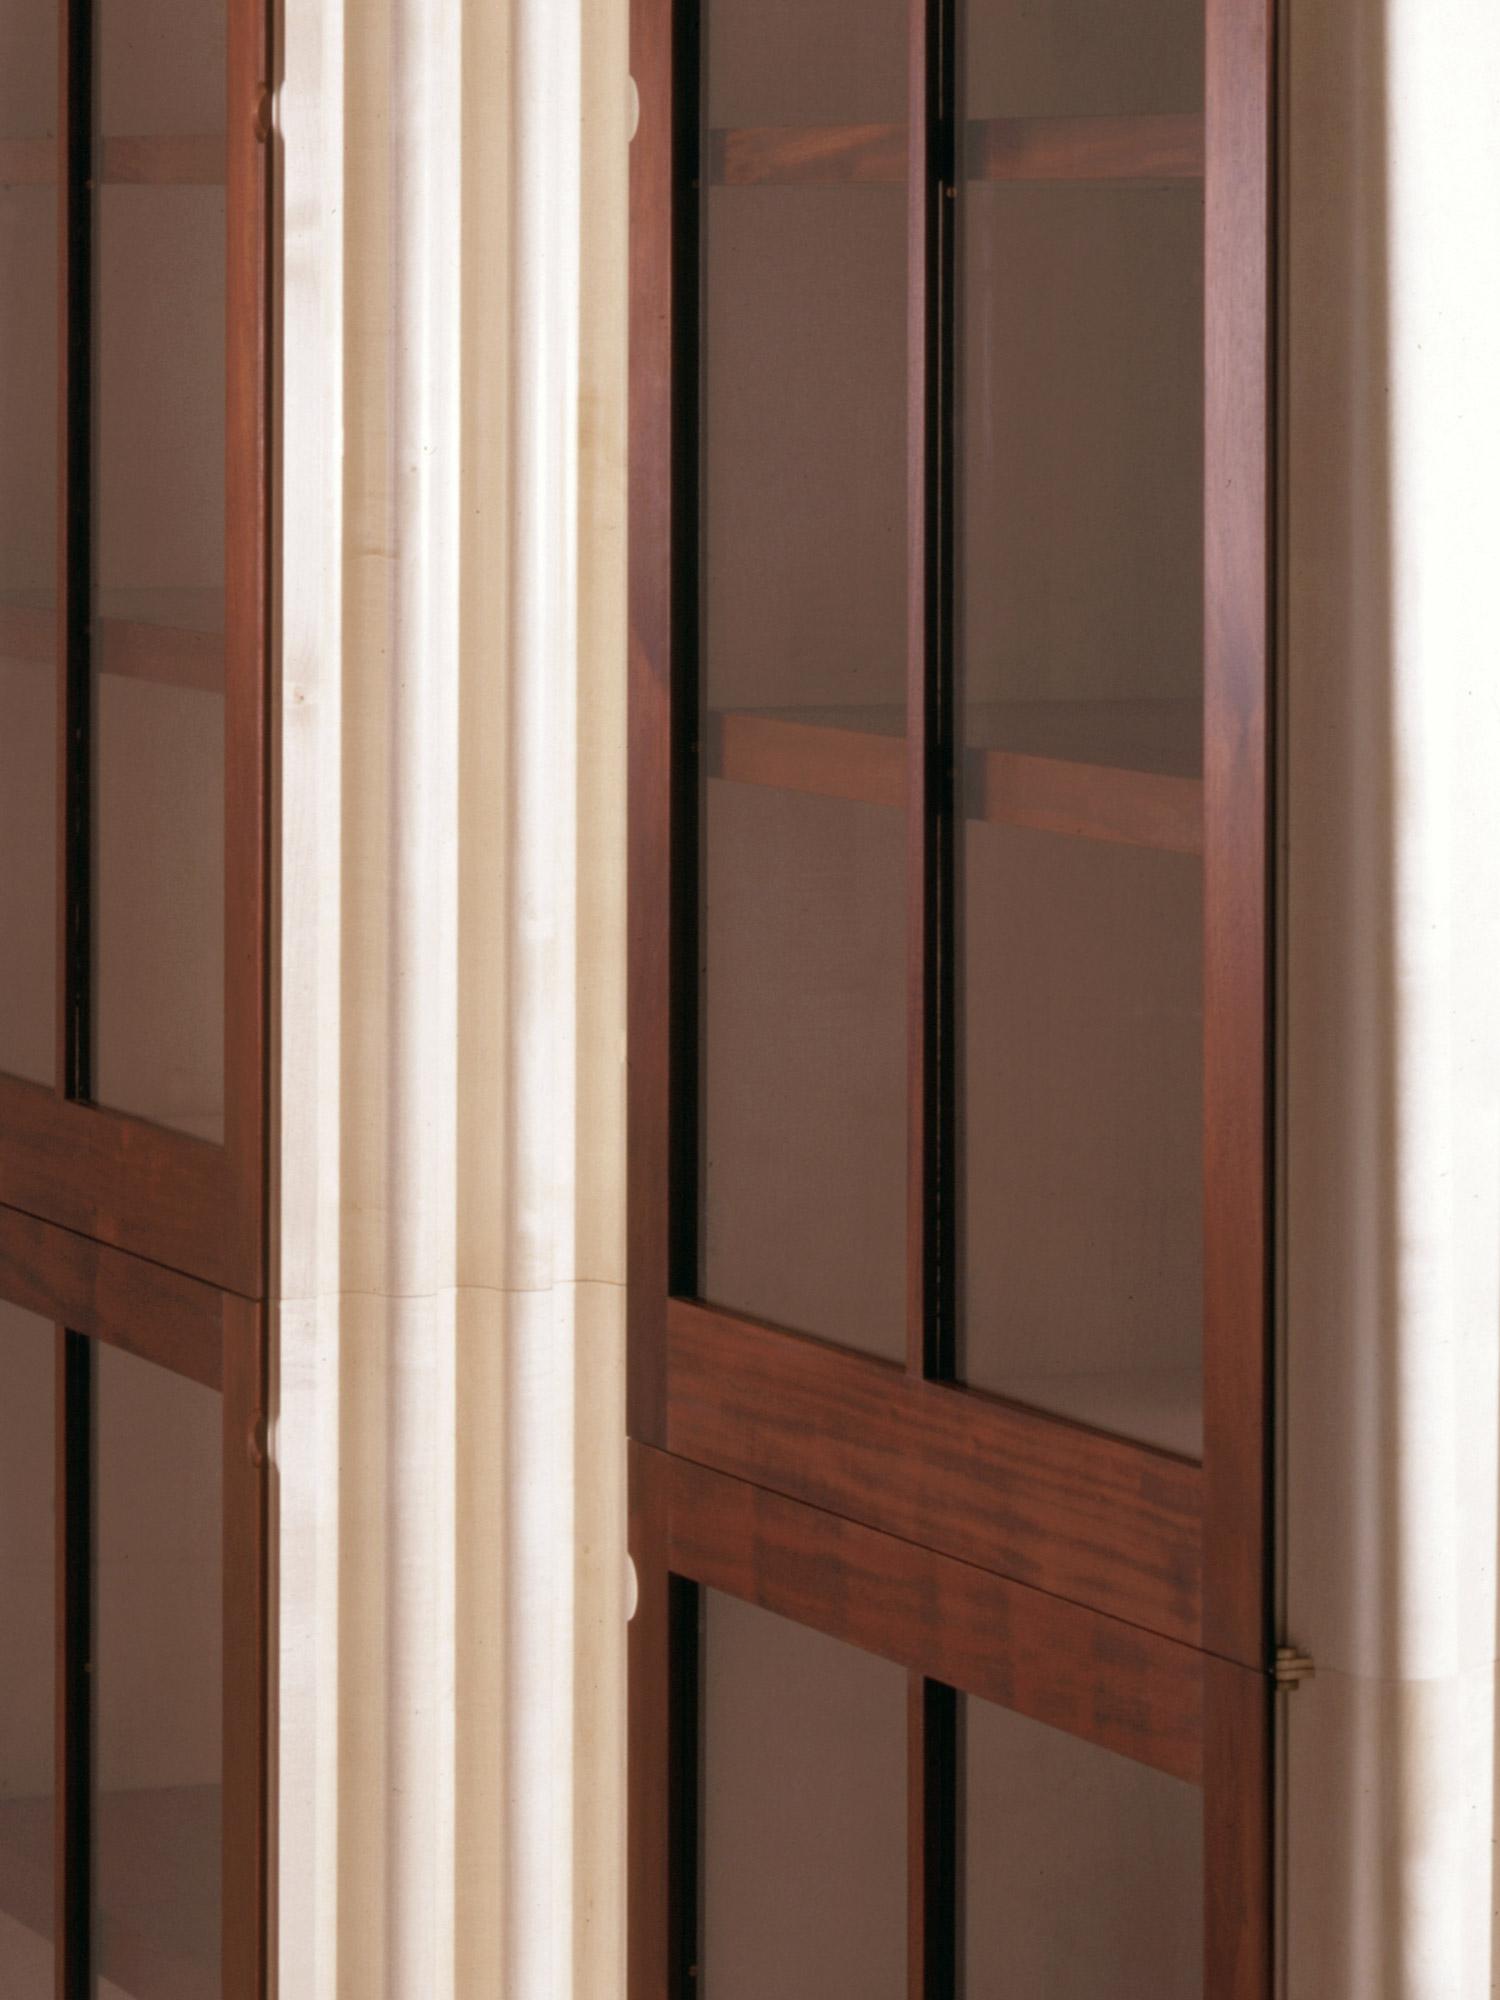 Tall Glazed Cabinets In Cuban Mahogany Makers Eye